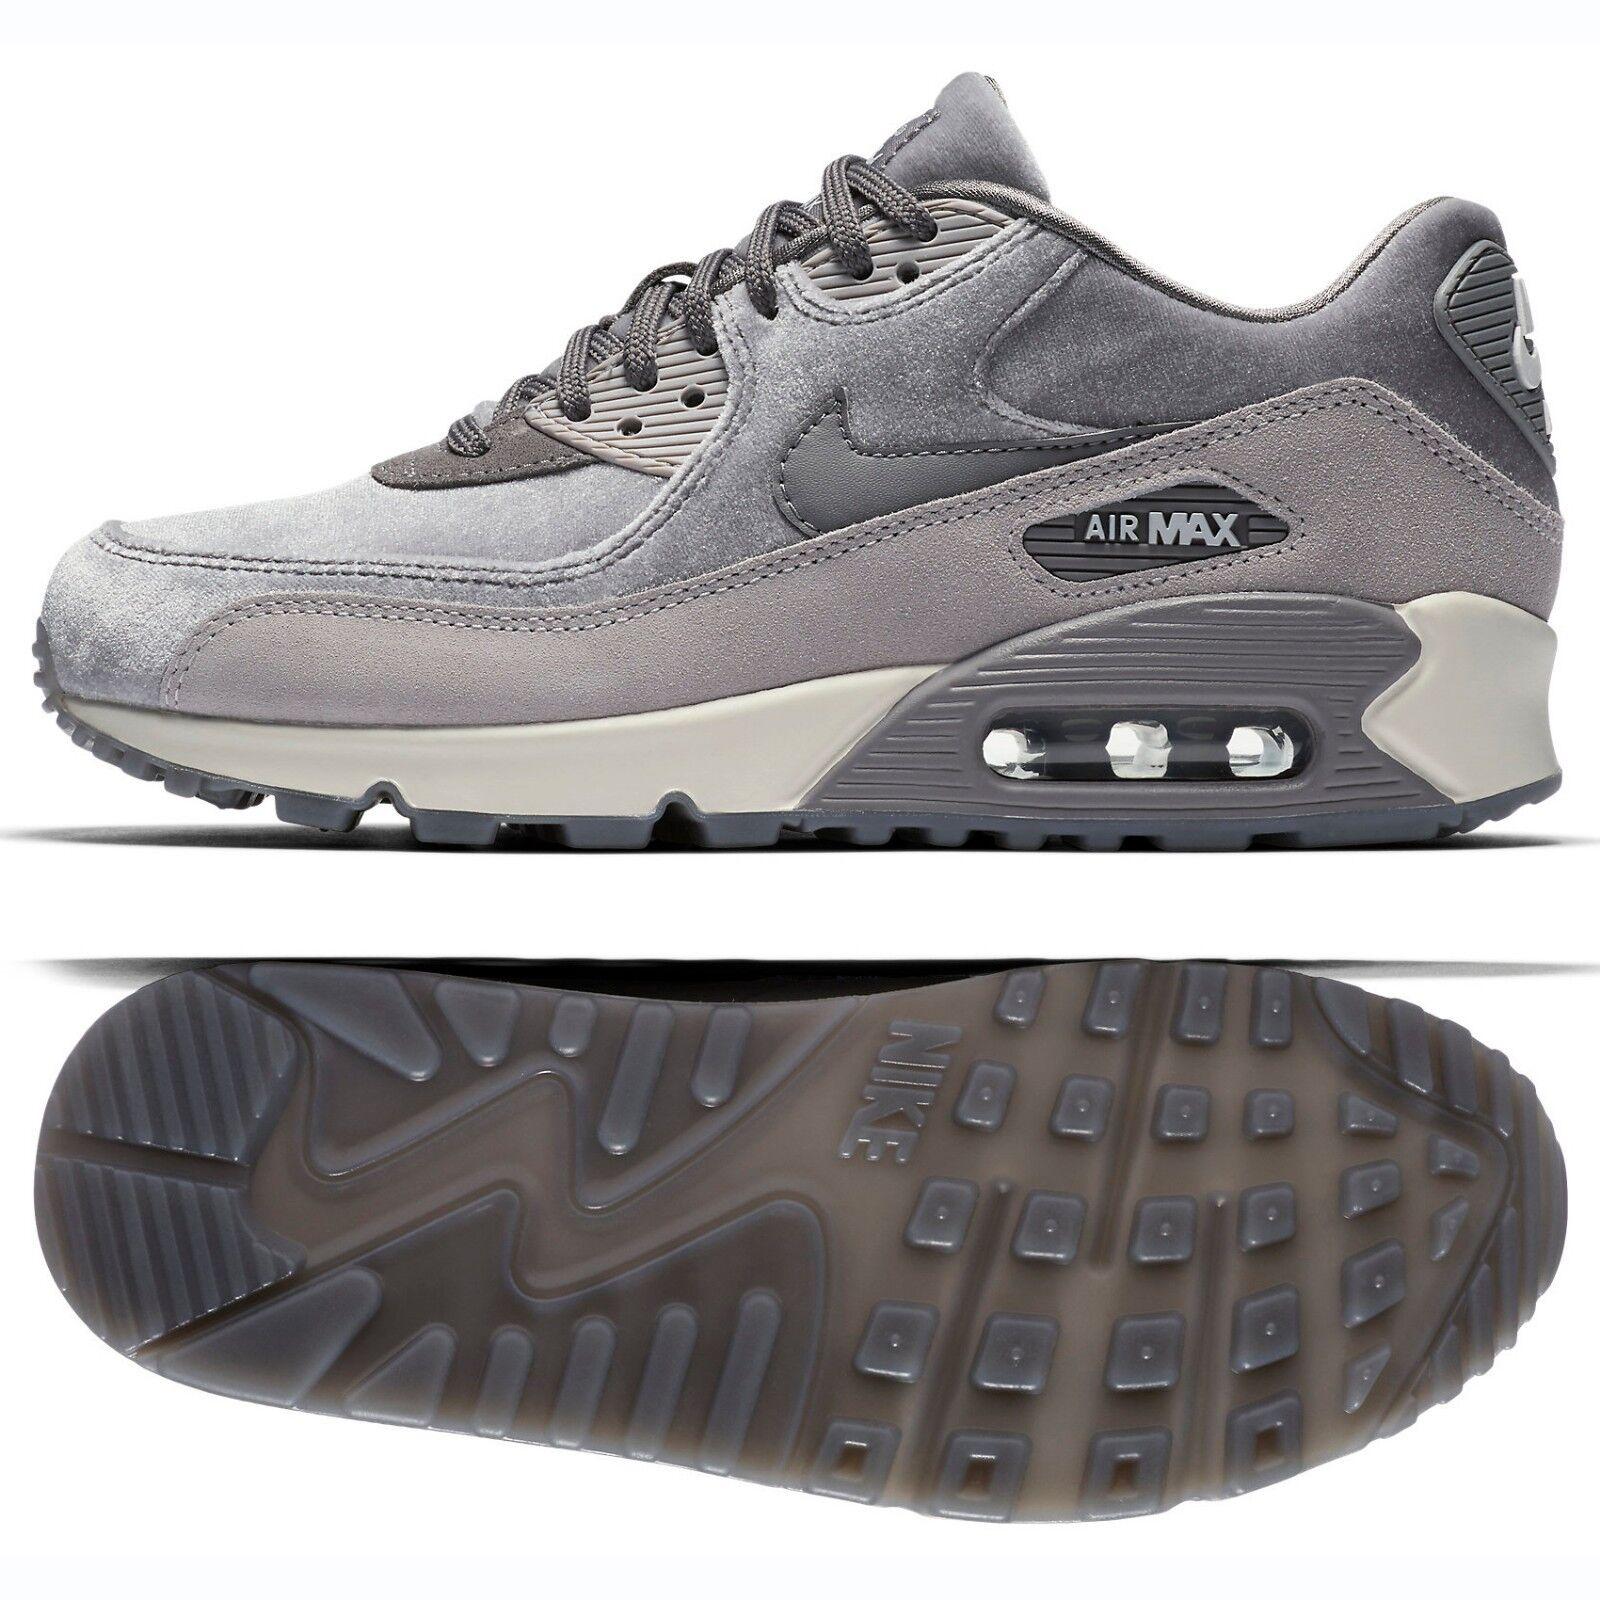 Nike Grey WMNS Air Max 90 LX 898512-007 Gunsmoke Grey Nike Atmosphere Suede Women's Shoes 47735c